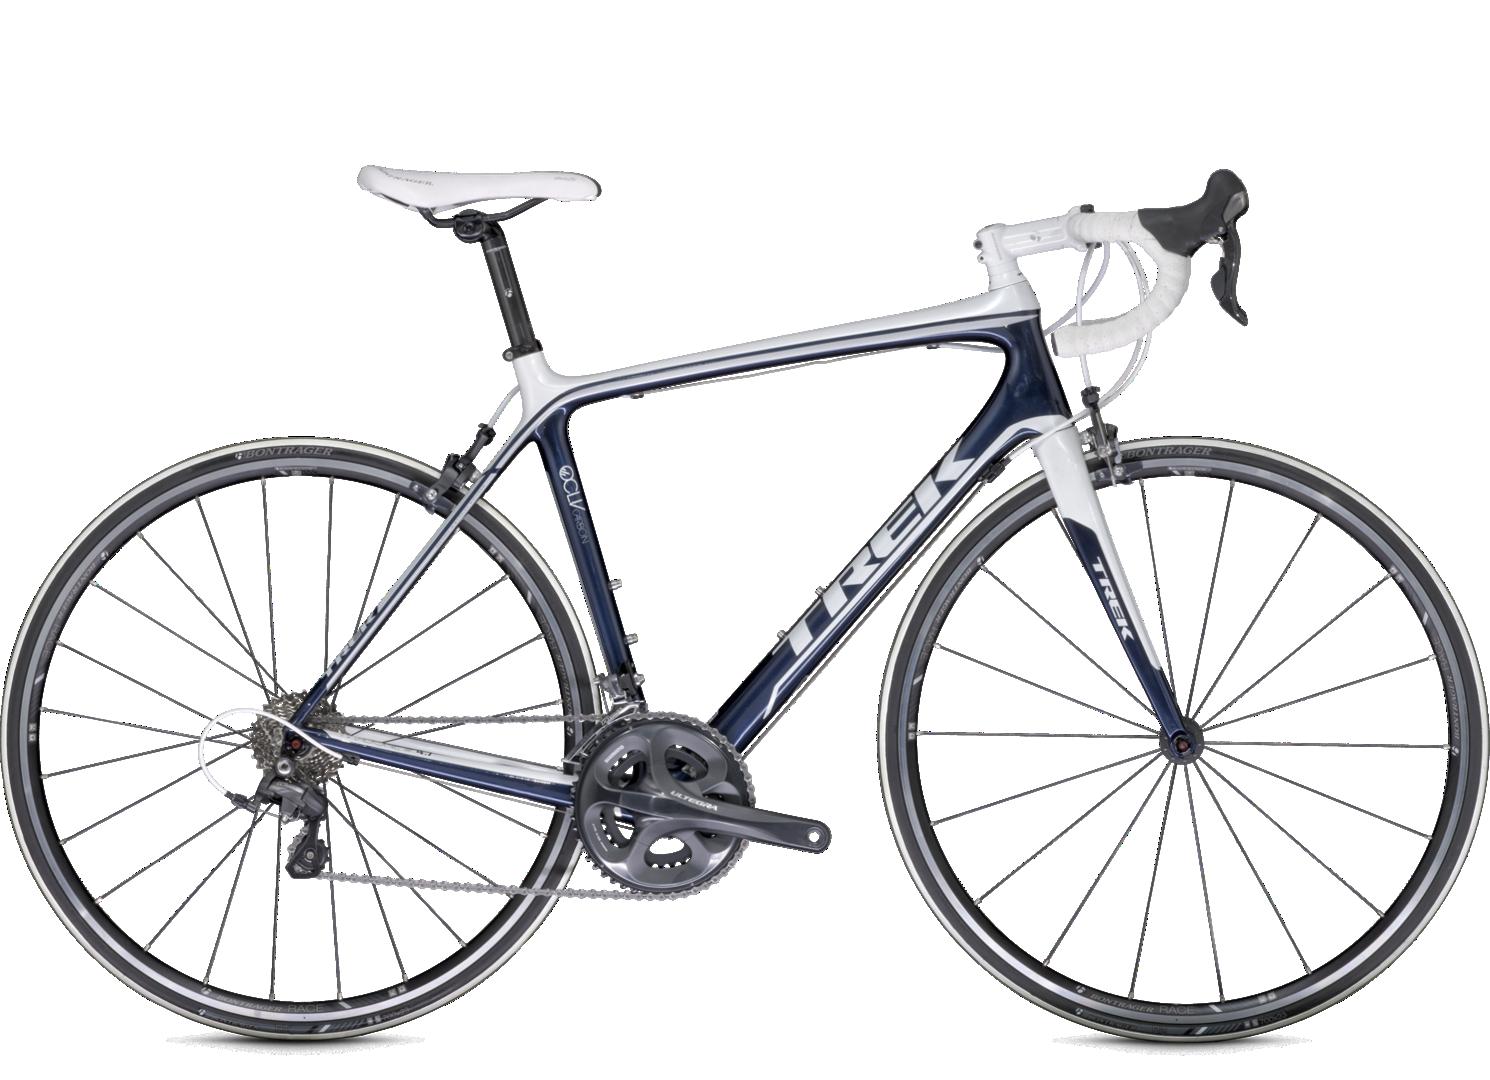 ebe11c2f371 2013 Madone 4.7 H2 (Compact) - Bike Archive - Trek Bicycle